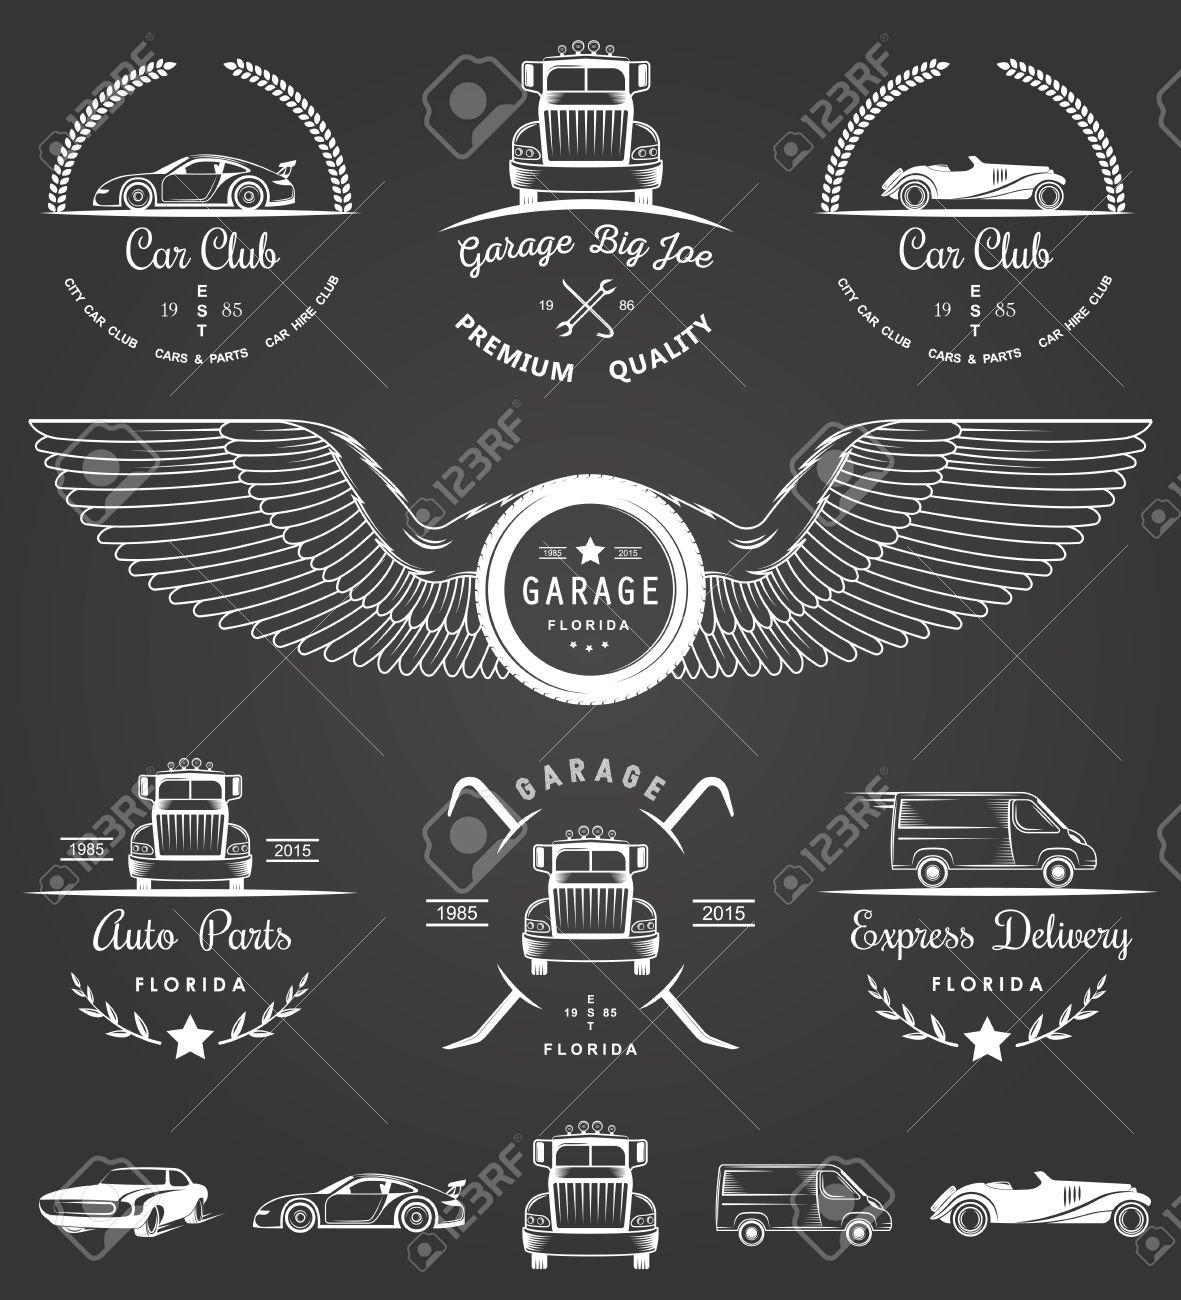 Car club sticker designs - Set Of Vintage Car Club Drift Club Auto Parts And Garage Labels Badges